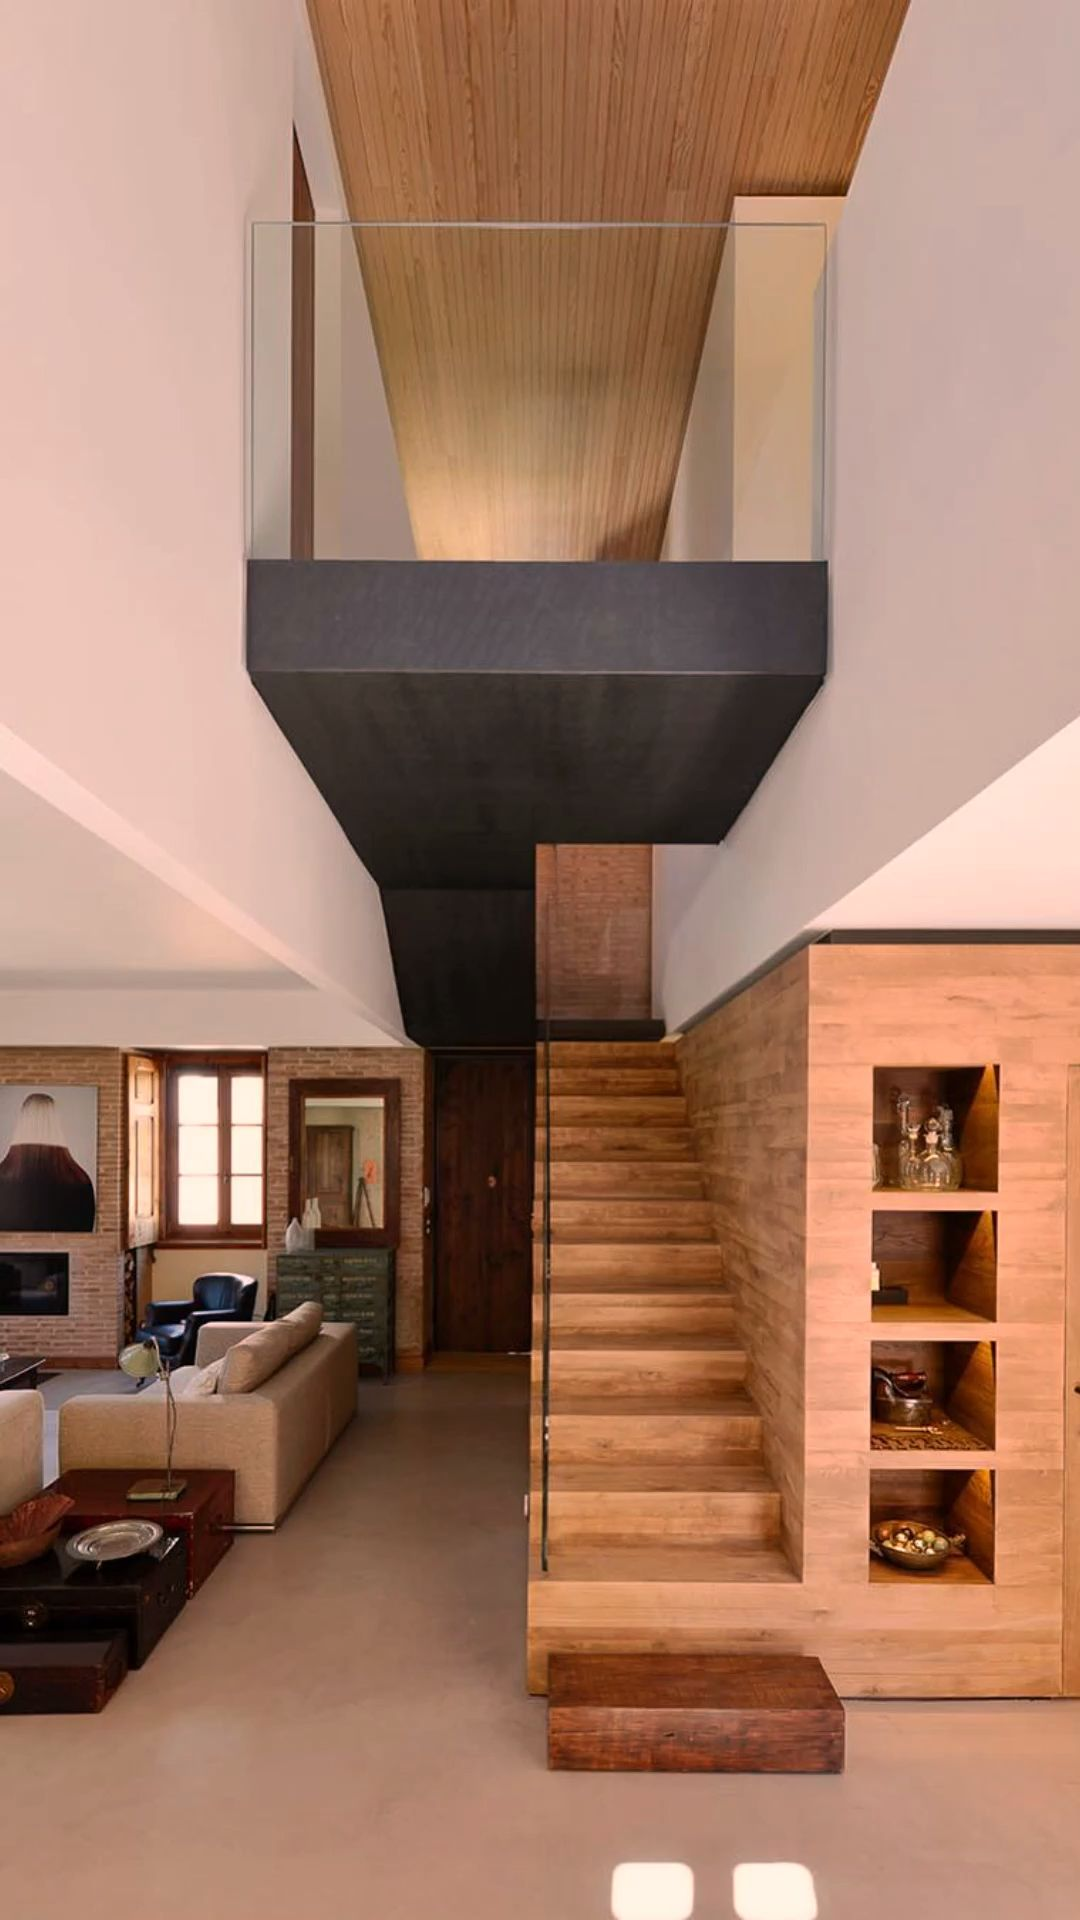 House in Estoril, Portugal by Ricardo Moreno Arquitectos. INSTAGRAM: roberto_davino